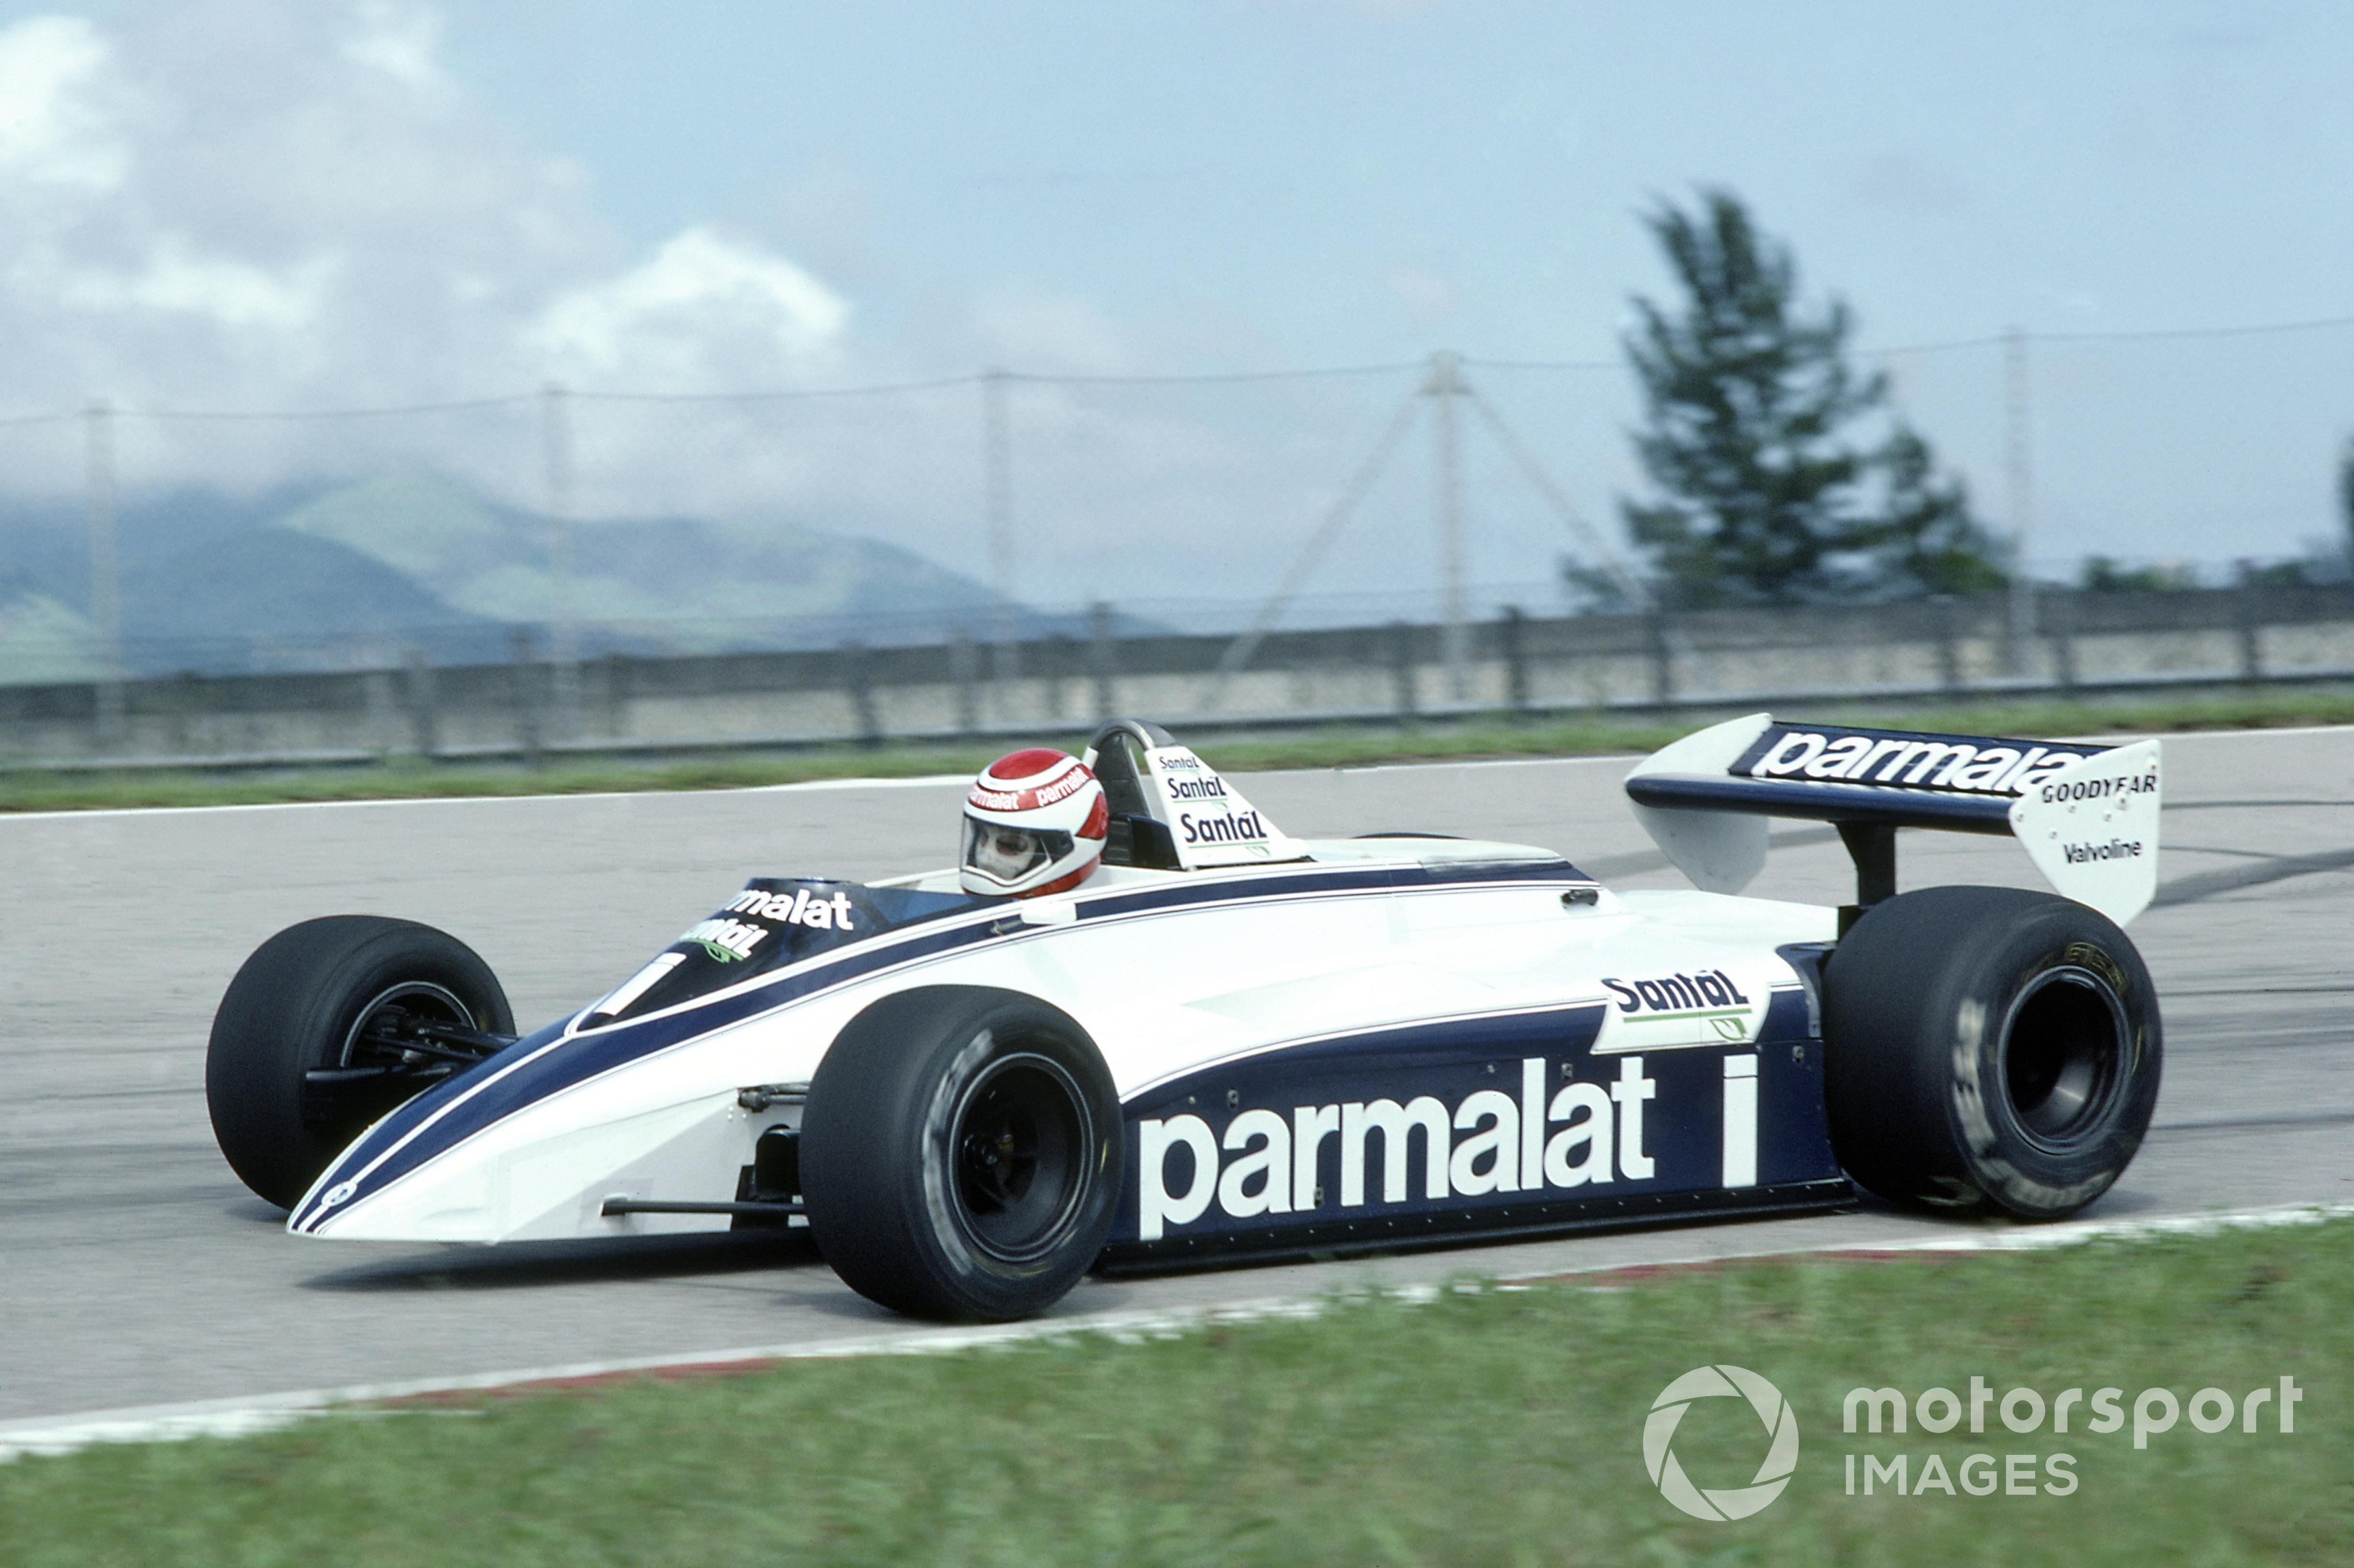 Nelson Piquet (Brabham BT49D-Ford Cosworth), descalificado en el GP de Brasil de 1982.